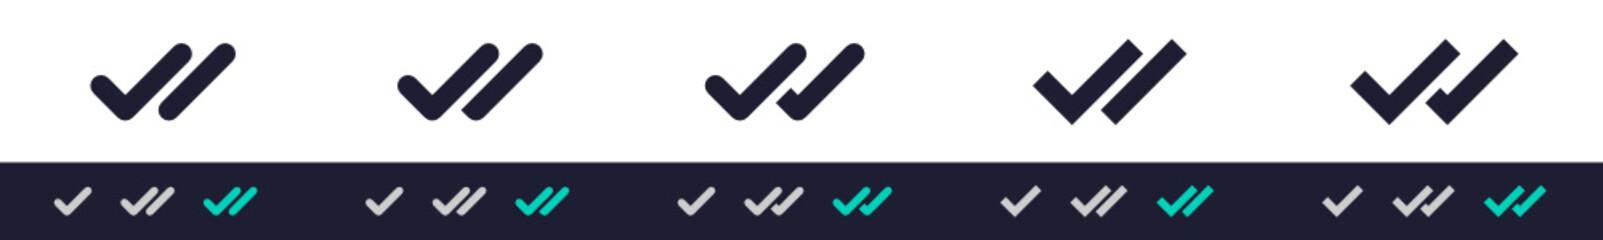 Fototapeta Double check icon form message send status. Two ticks - sent, delivered, seen, vector icon obraz